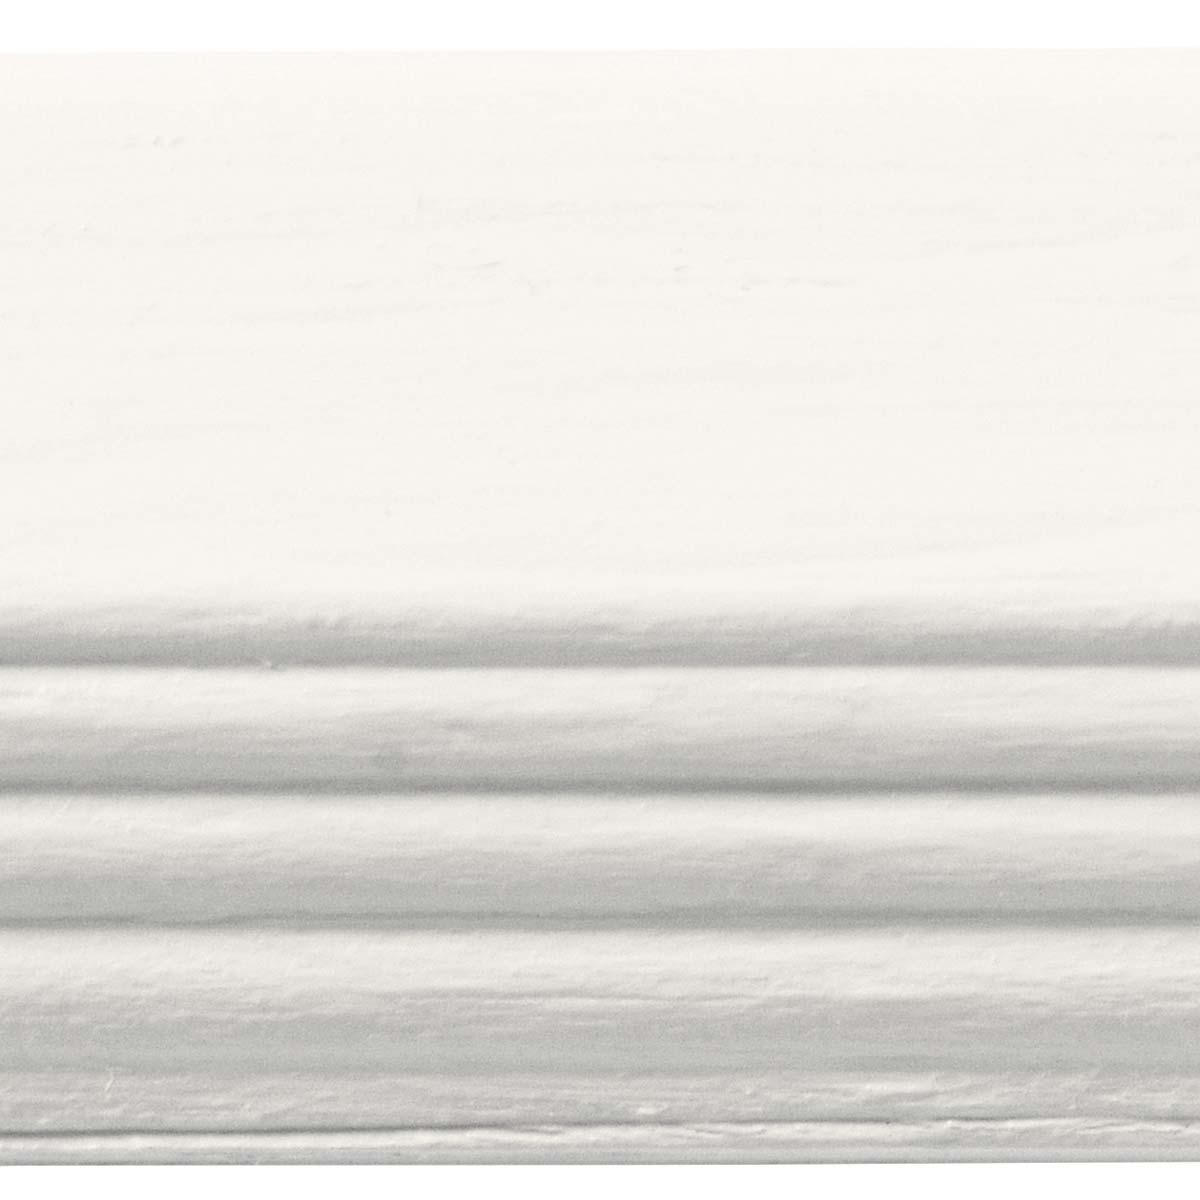 Waverly ® Inspirations Chalk Finish Acrylic Paint - Plaster, 16 oz.